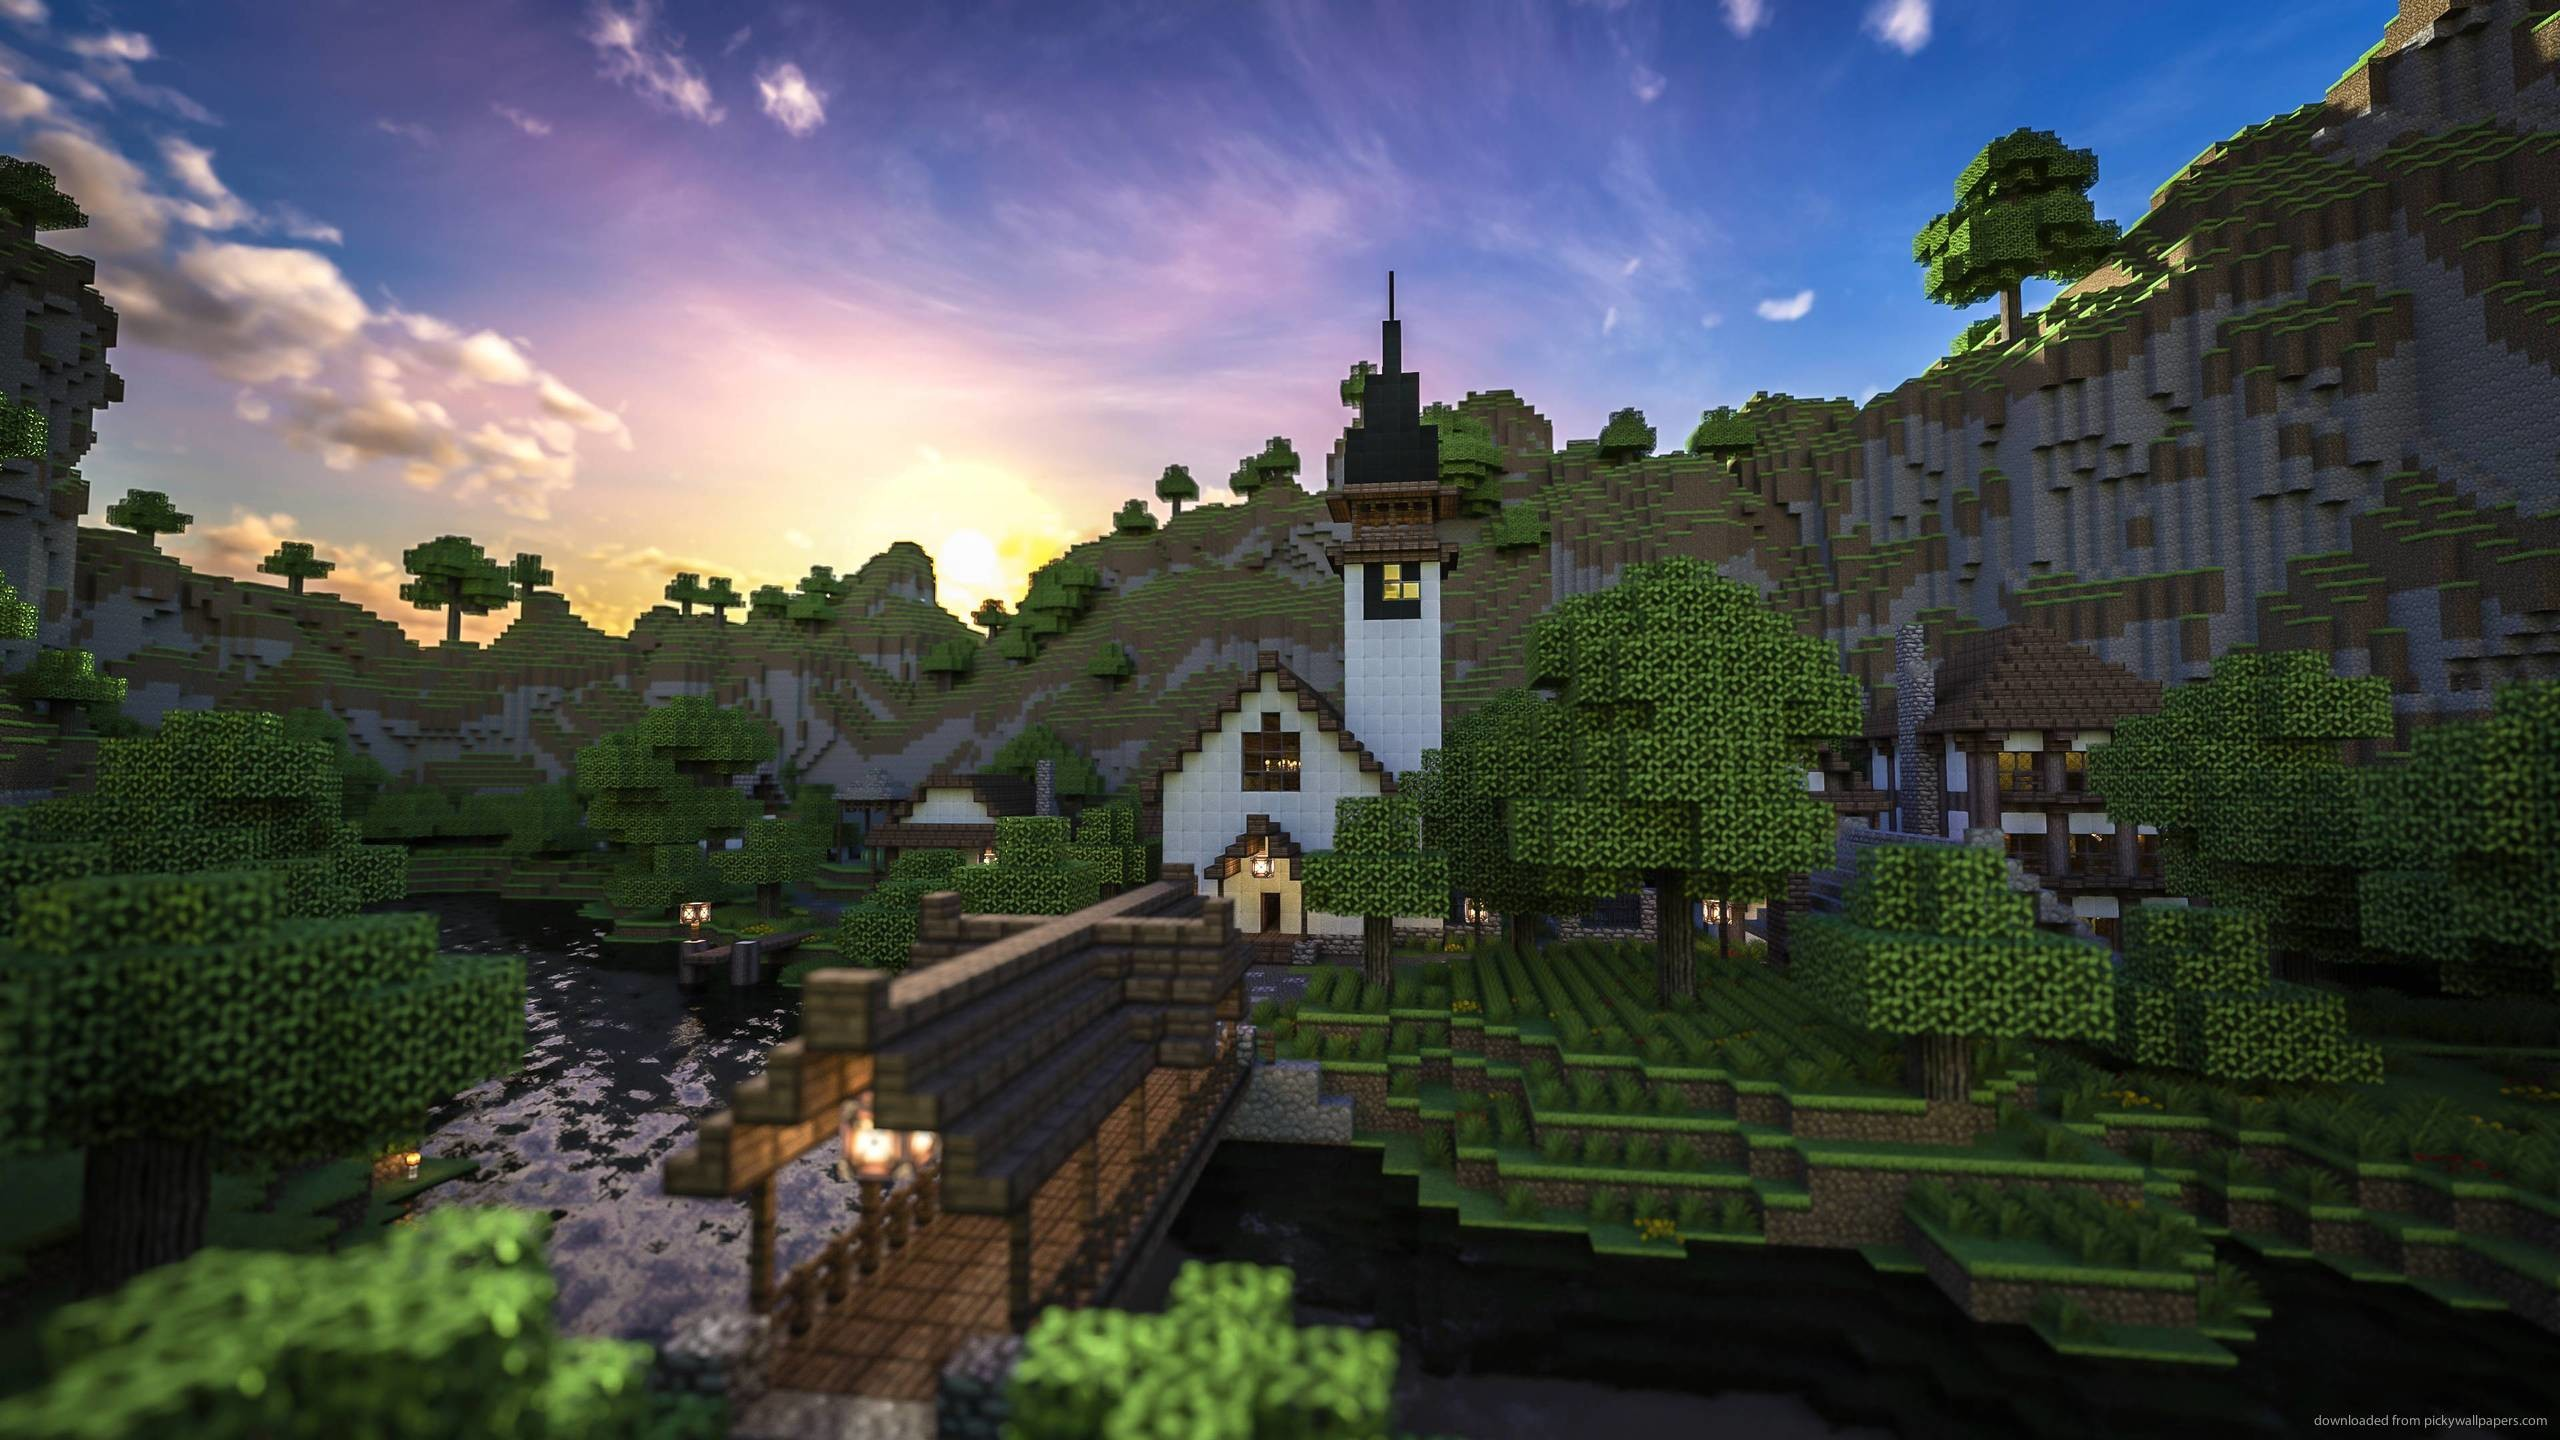 Minecraft Background 76 Images